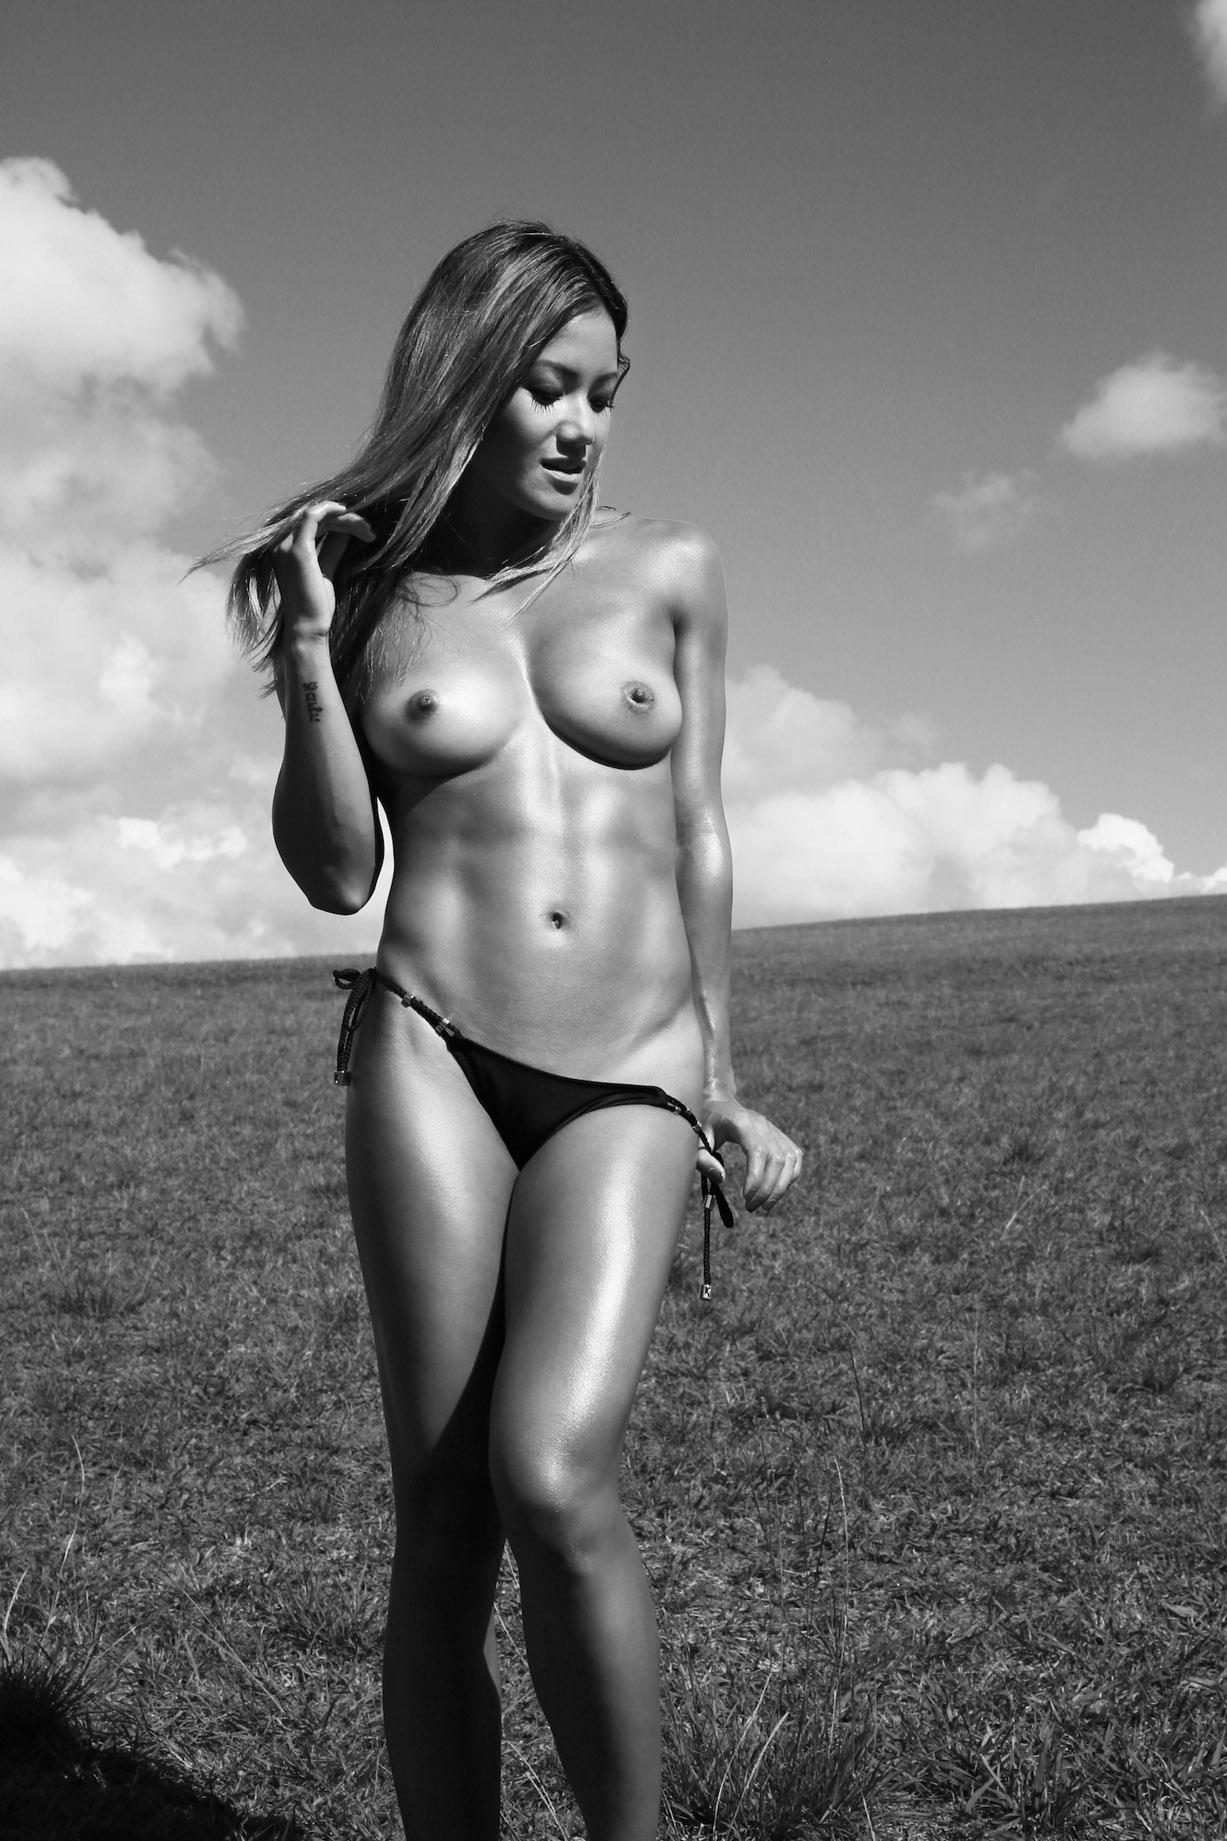 Claudia Klein nude by Josef Geranio